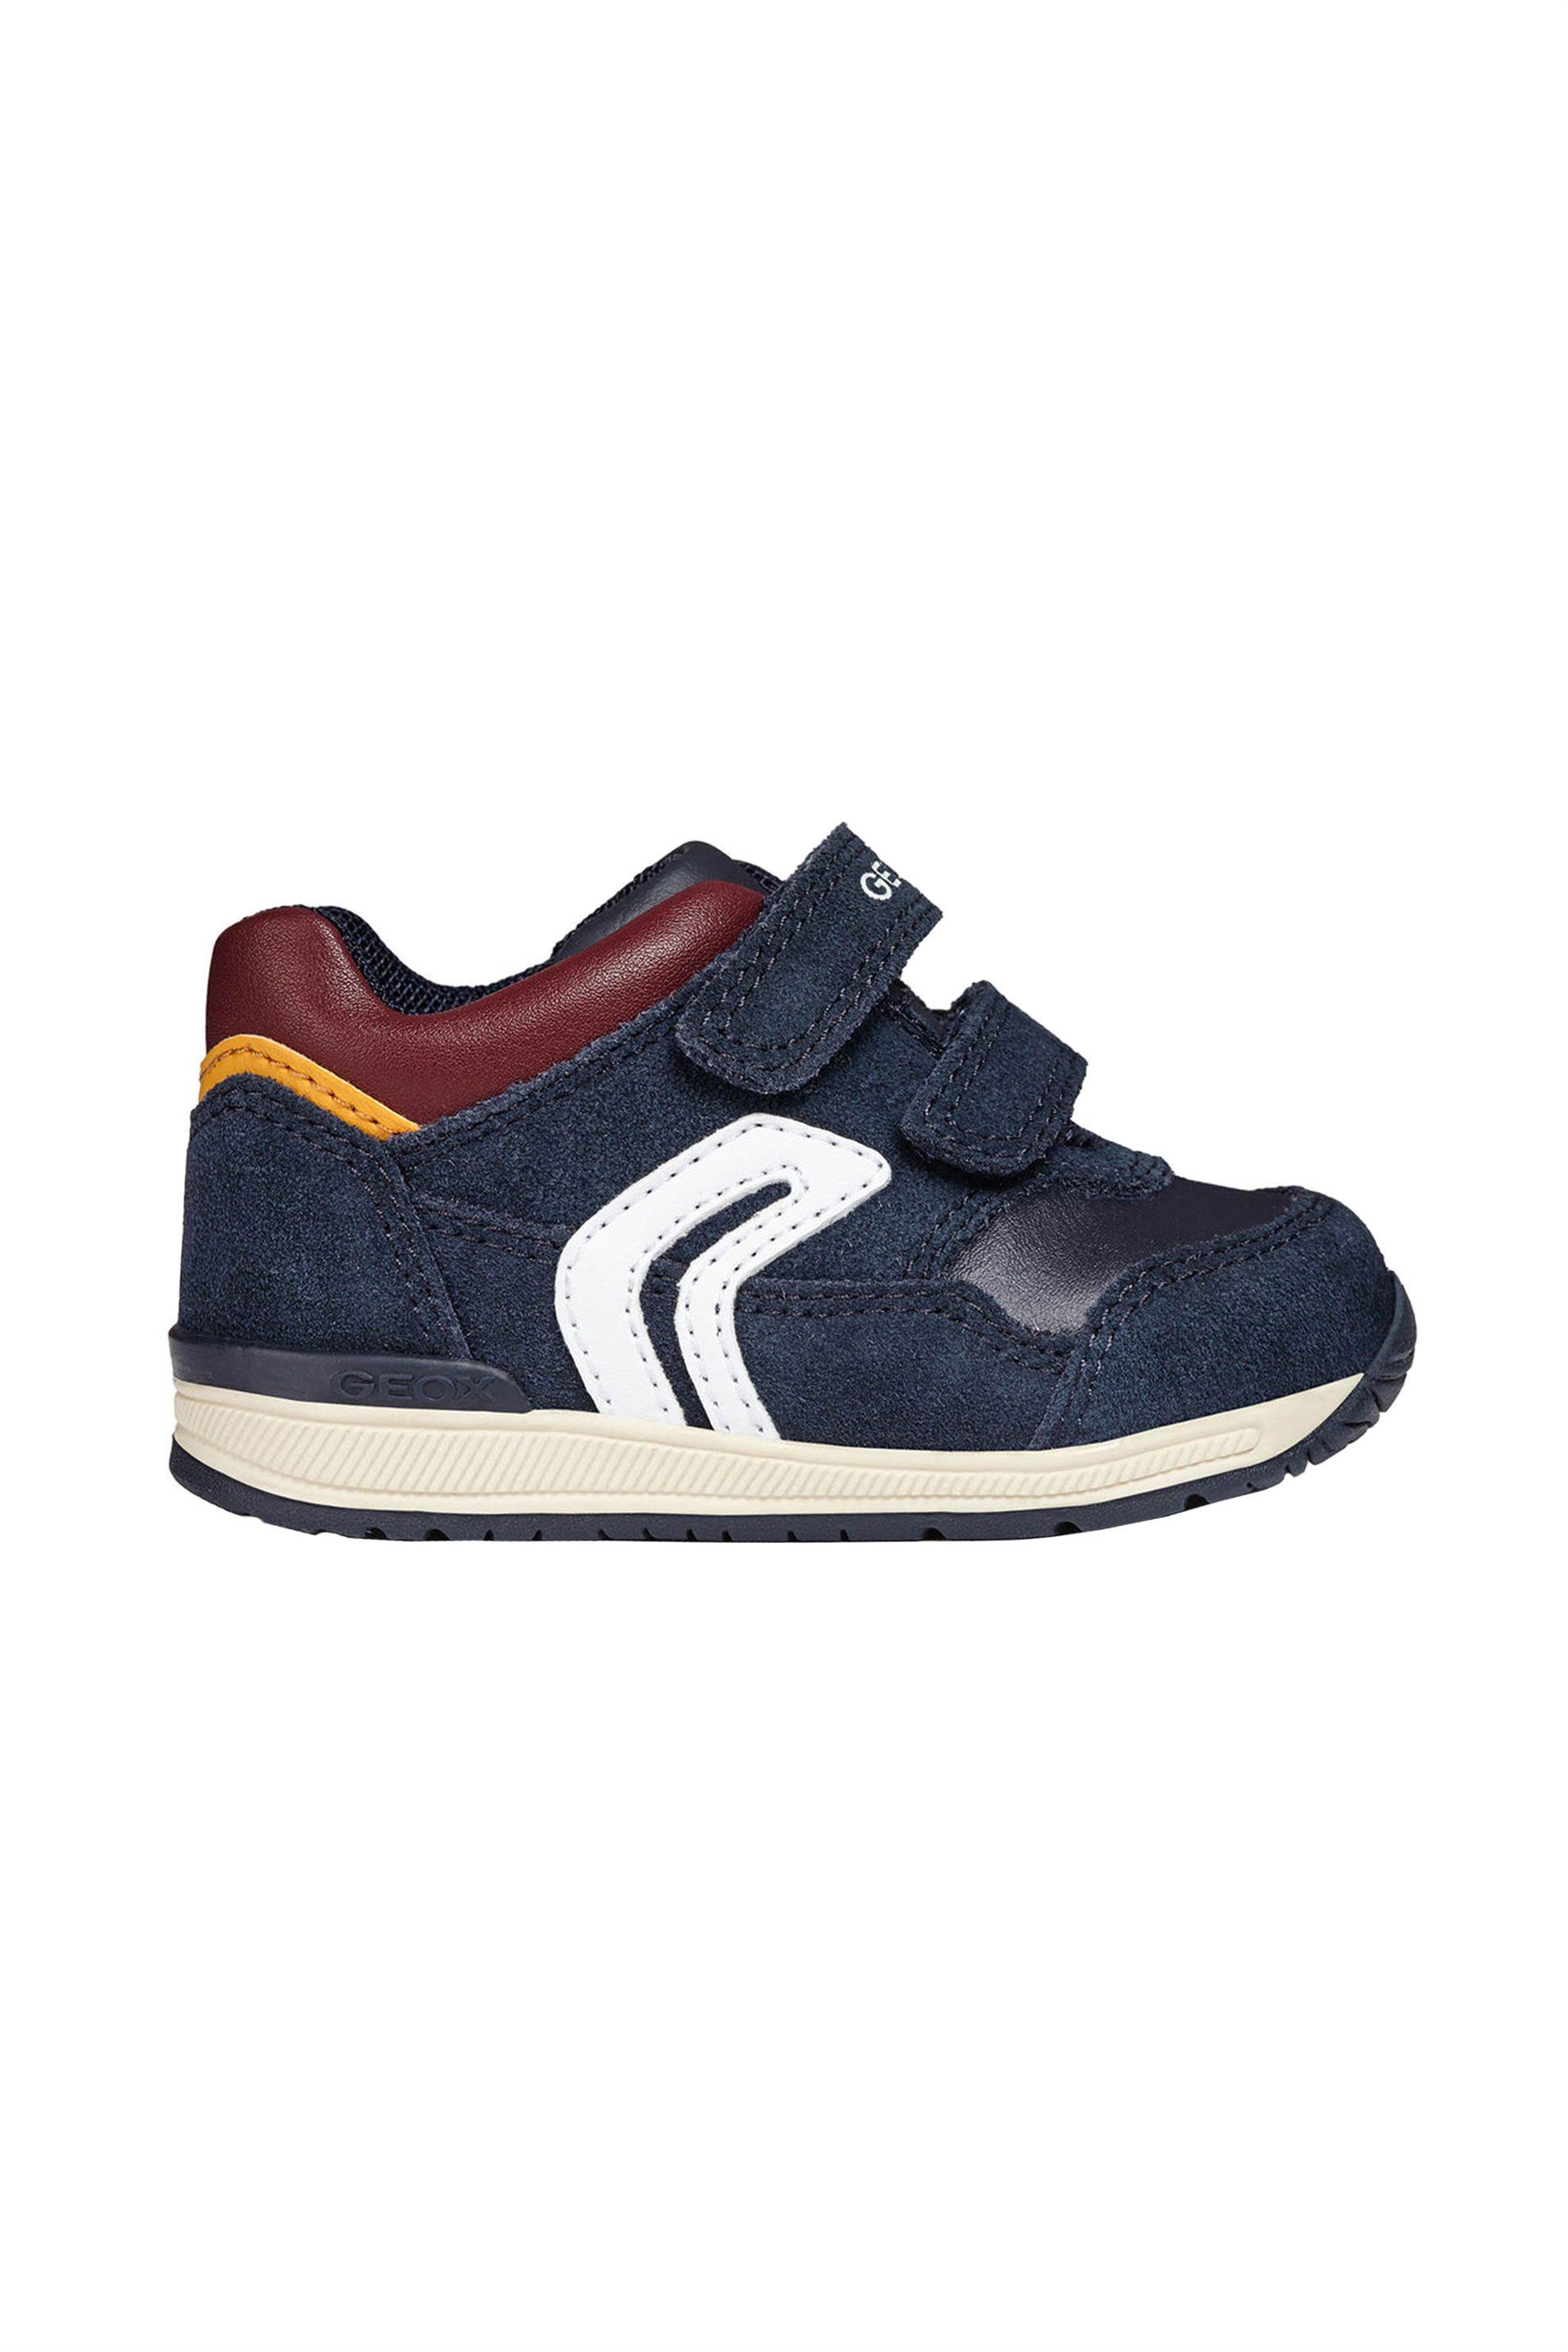 2ae122a9b68 Notos Geox βρεφικά sneakers Baby Rishon Boy - B840RA - Μπλε Σκούρο